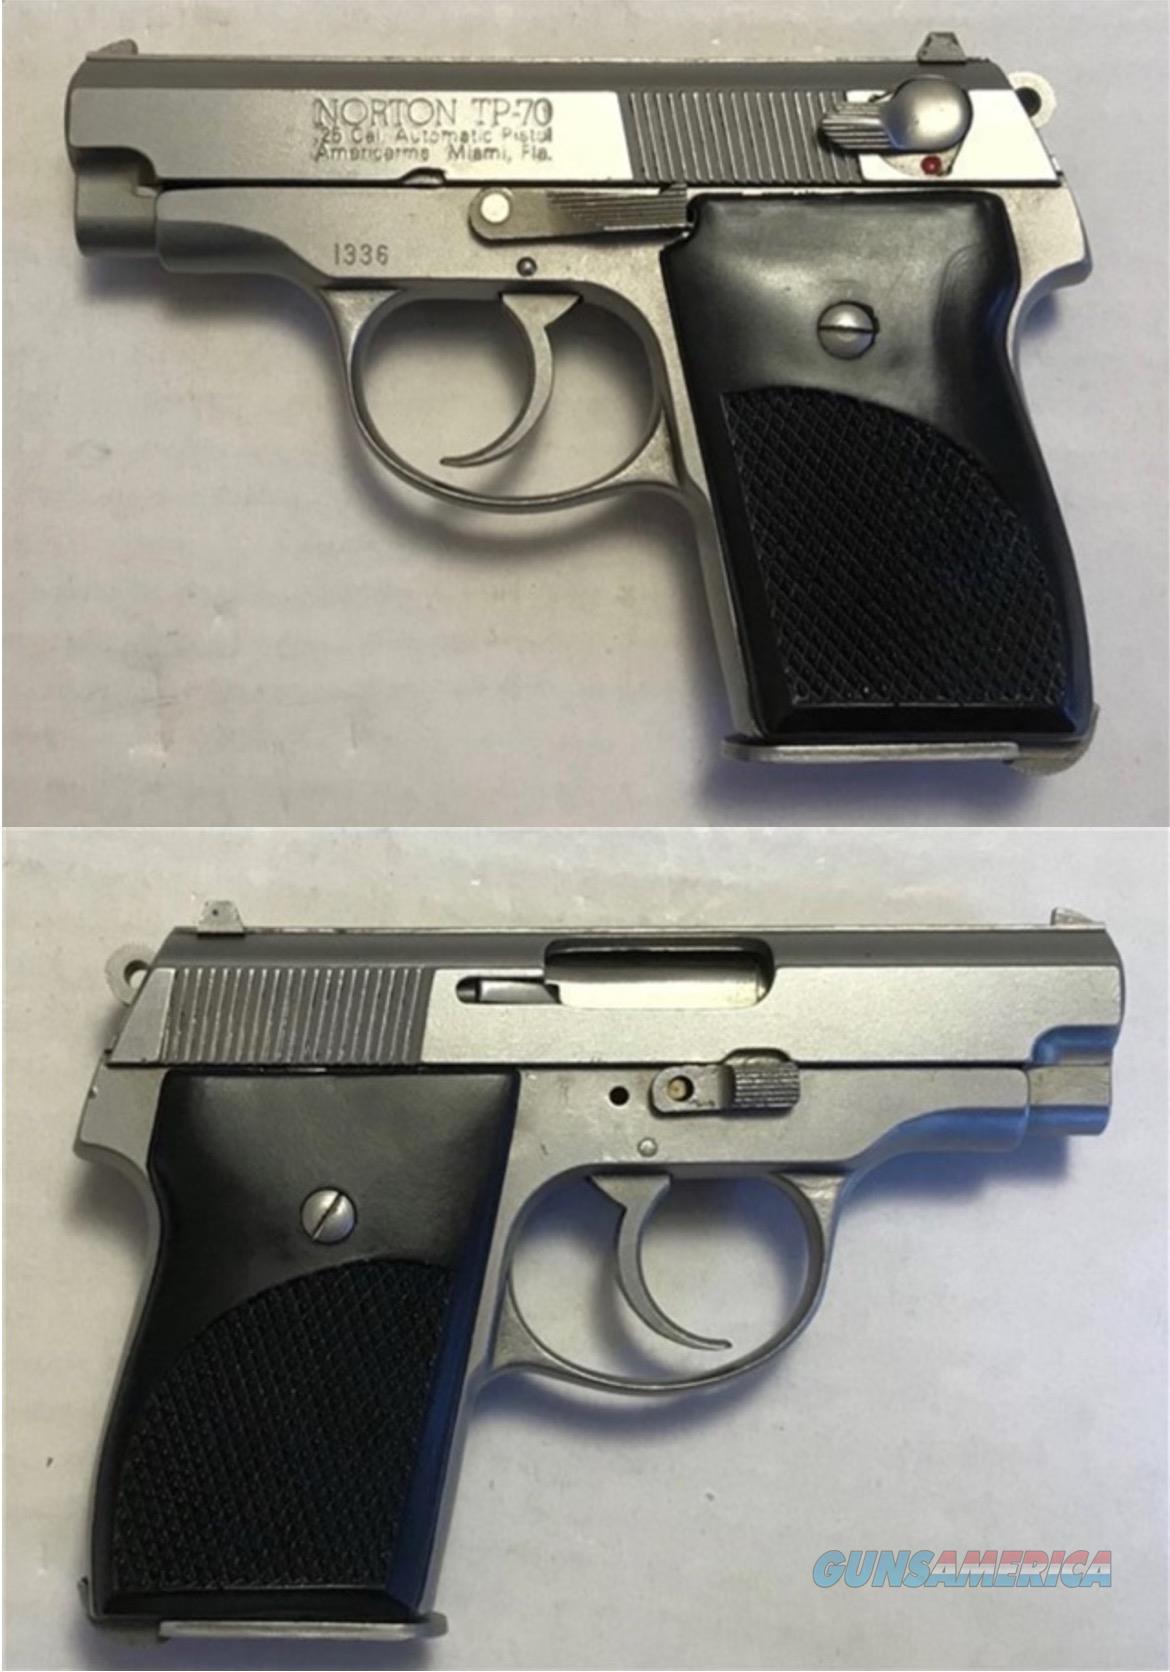 Norton Budischowsky American Arms TP70 - .25acp  Guns > Pistols > American Arms Pistols